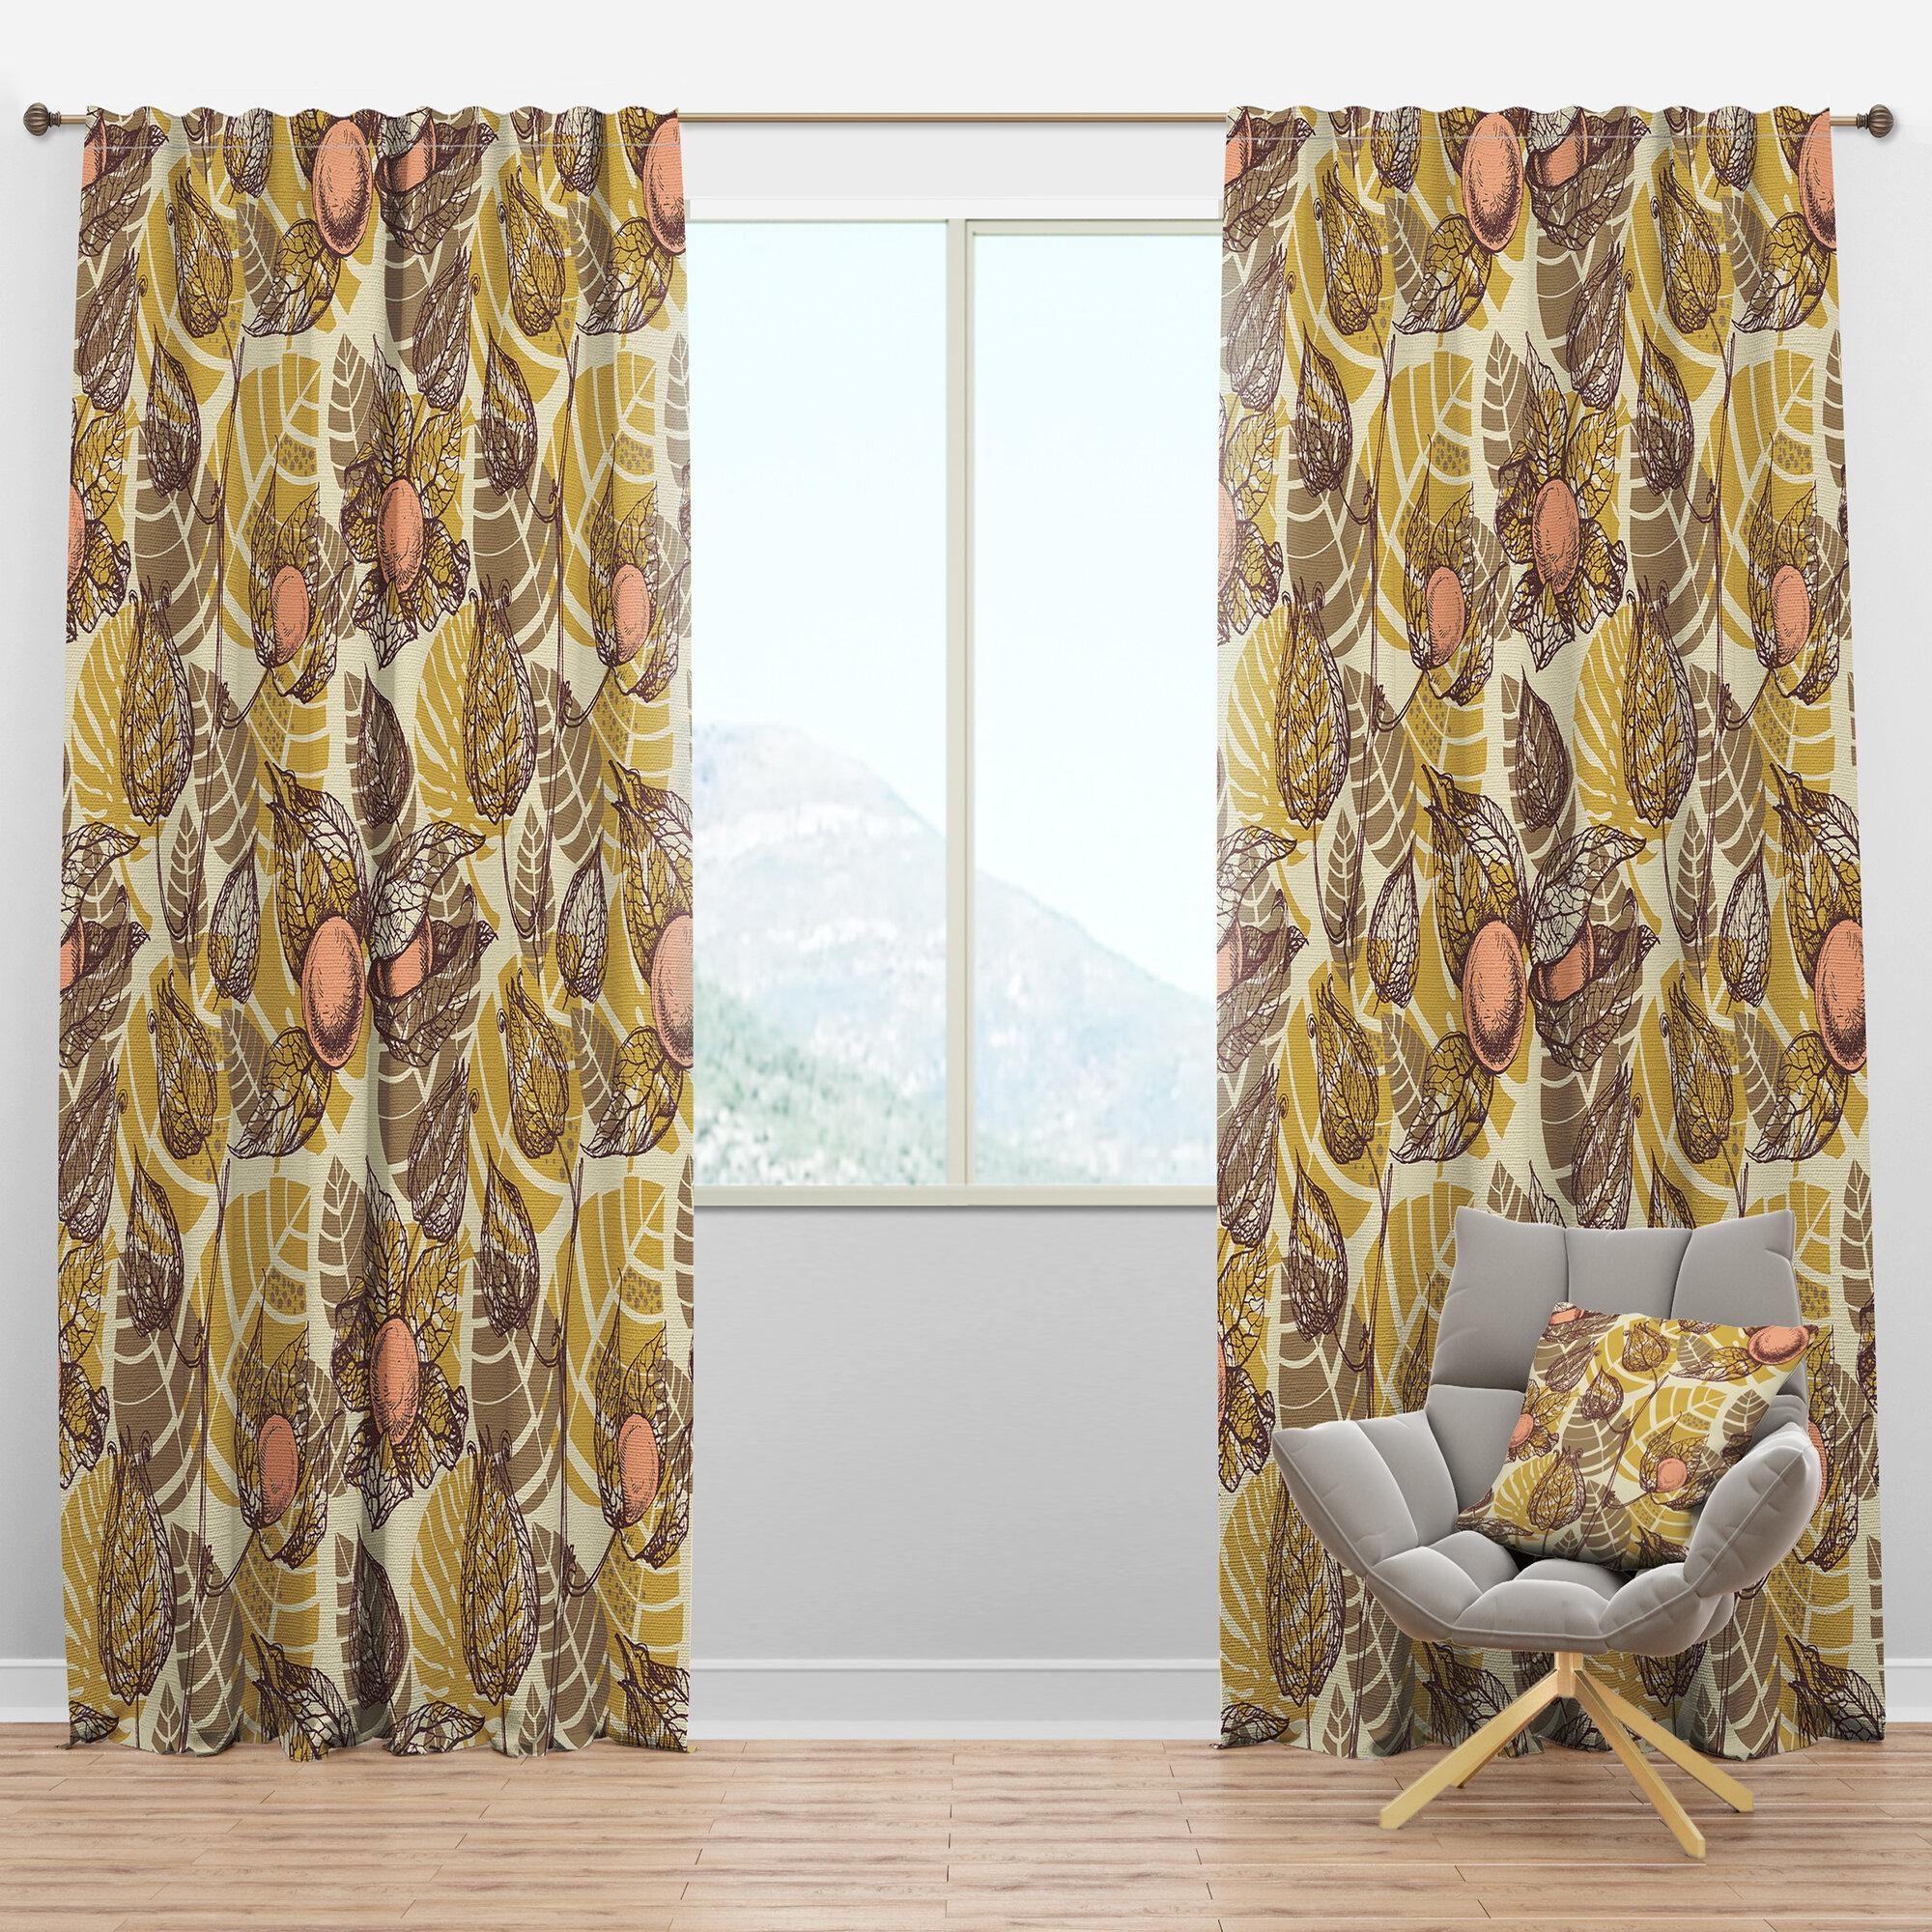 Designart Mid Century Physalis Drawing Floral Semi Sheer Thermal Rod Pocket Curtain Panels Wayfair